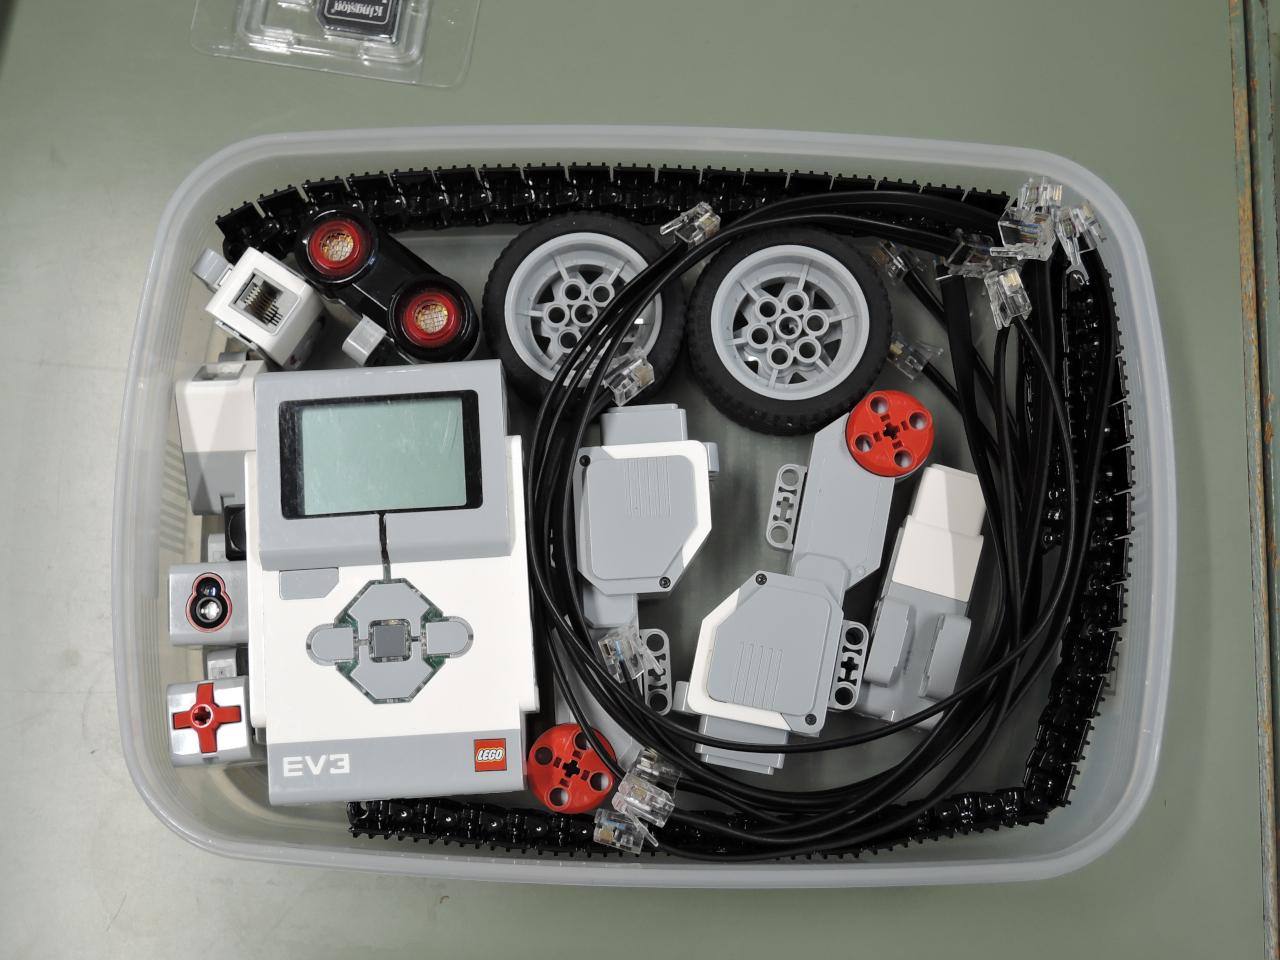 ev3-parts-case-1n.jpg